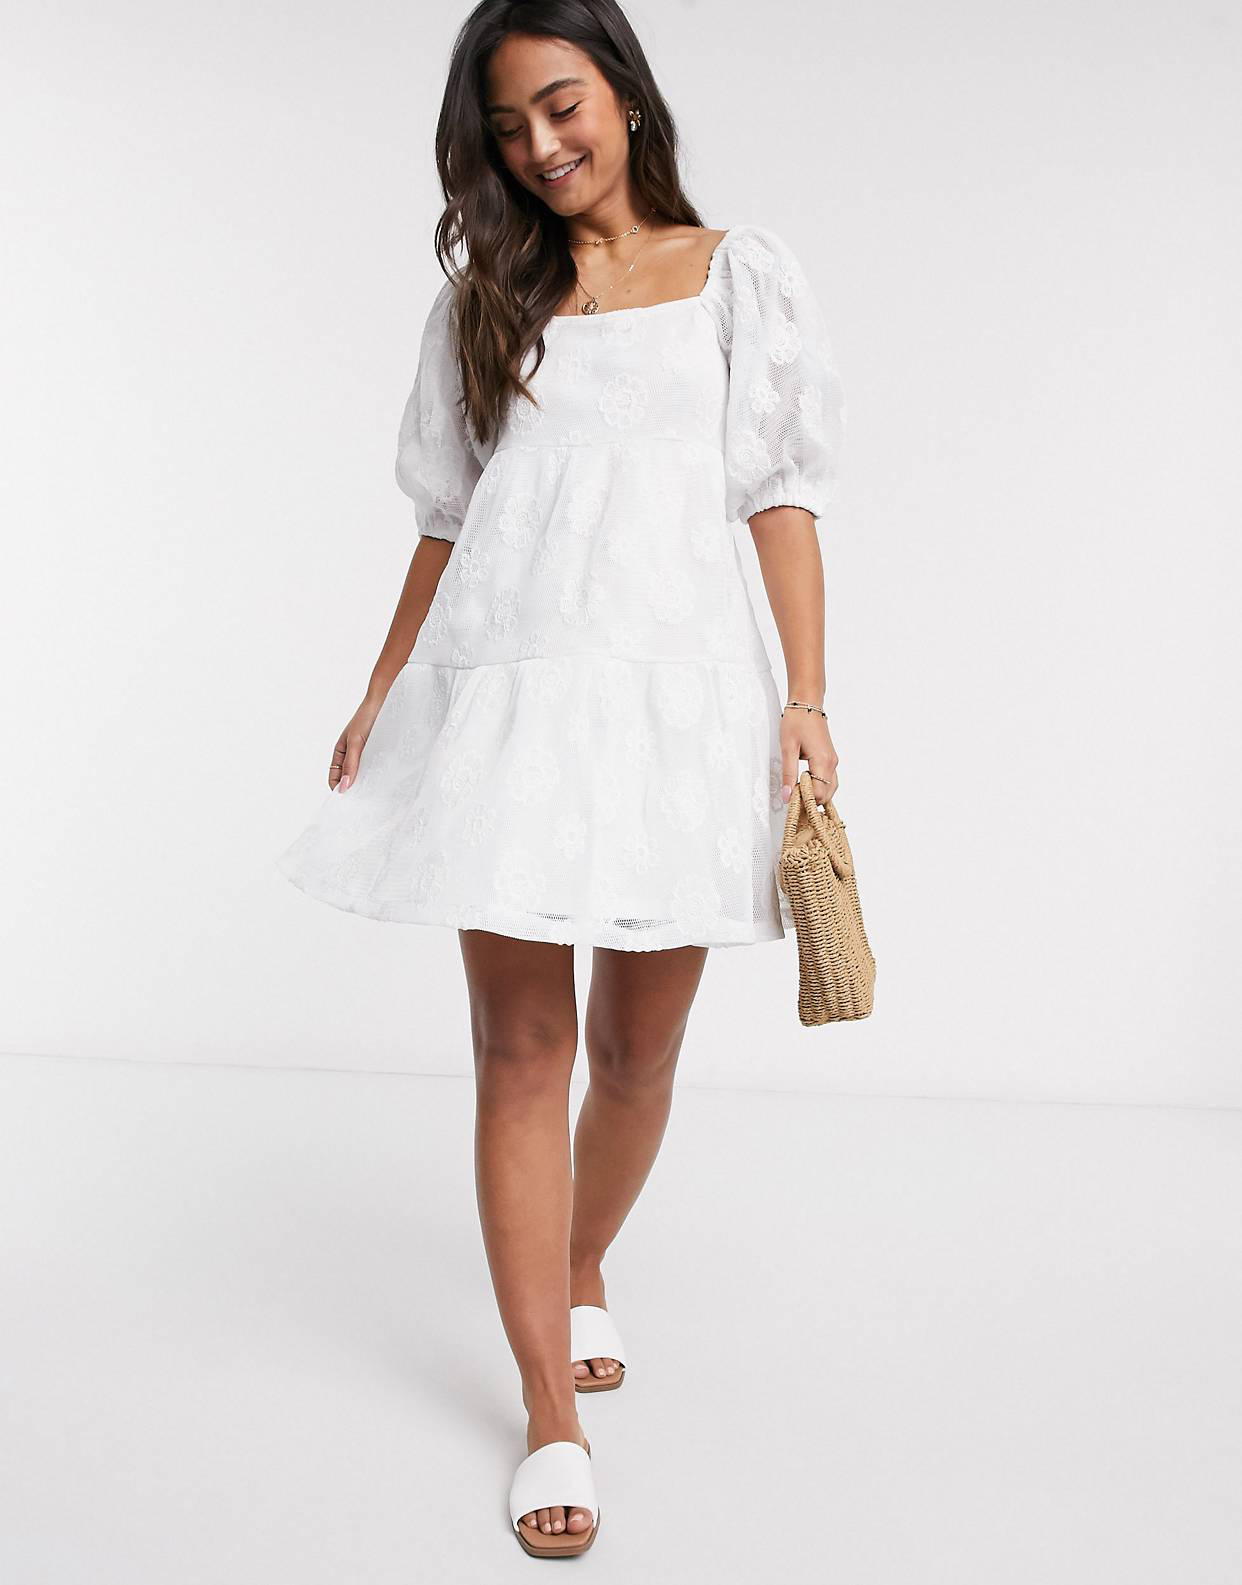 Vestido corto amplio con encaje bordado en blanco de ASOS DESIGN